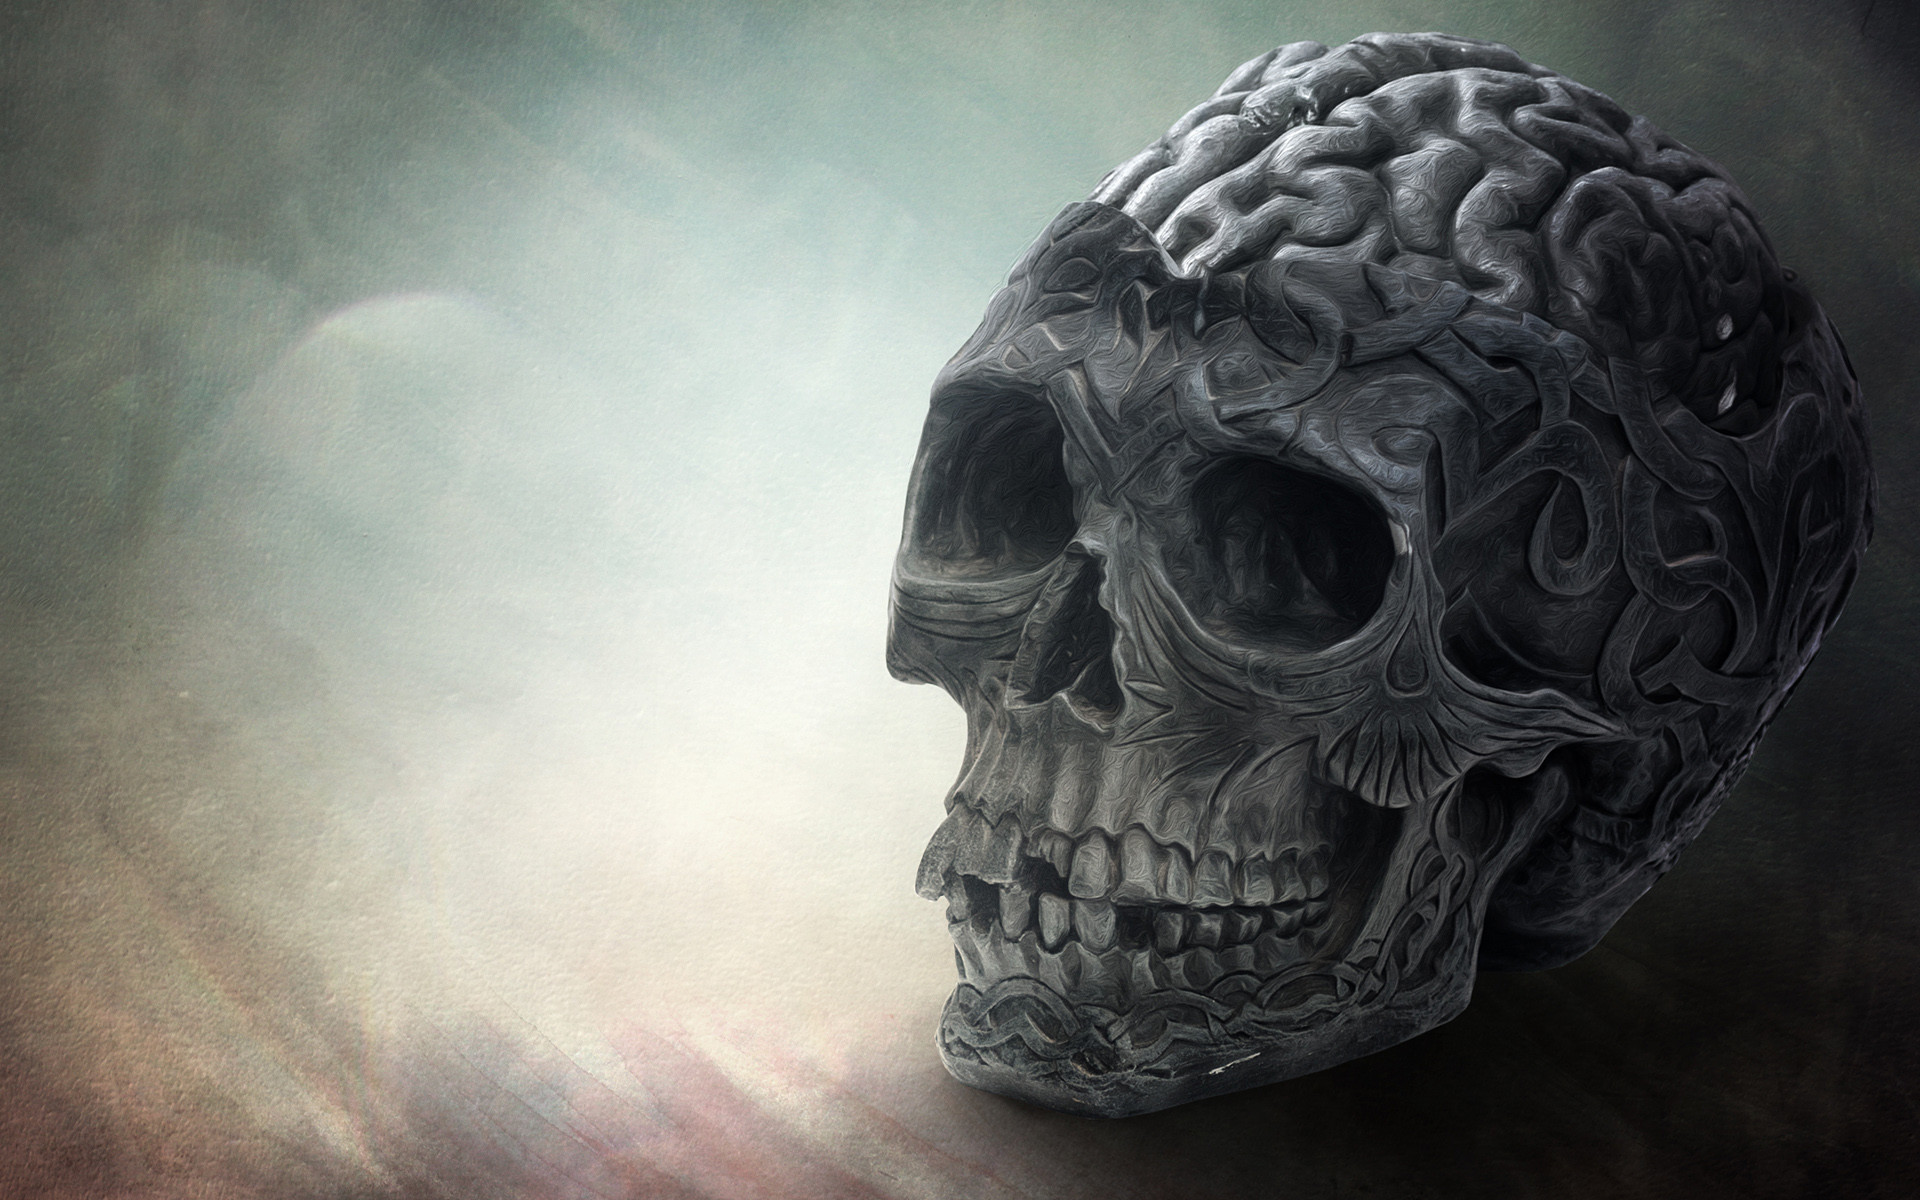 brain pc hd wallpapers free download desktop free download hd skull .